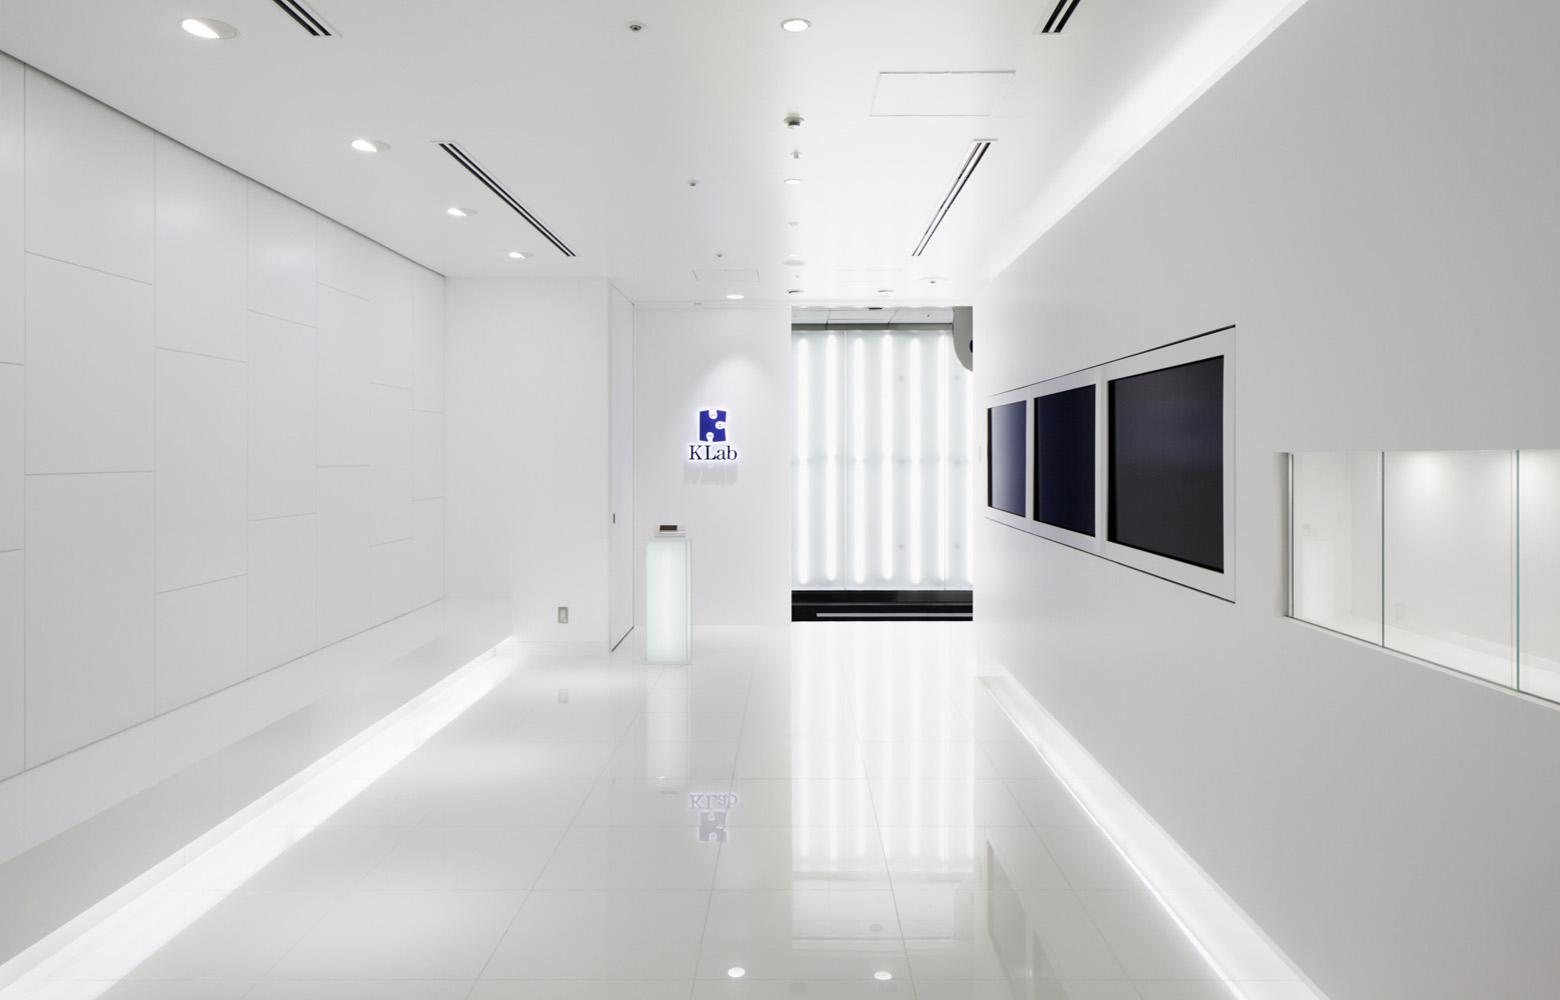 KLab株式会社 Entrance_2 デザイン・レイアウト事例